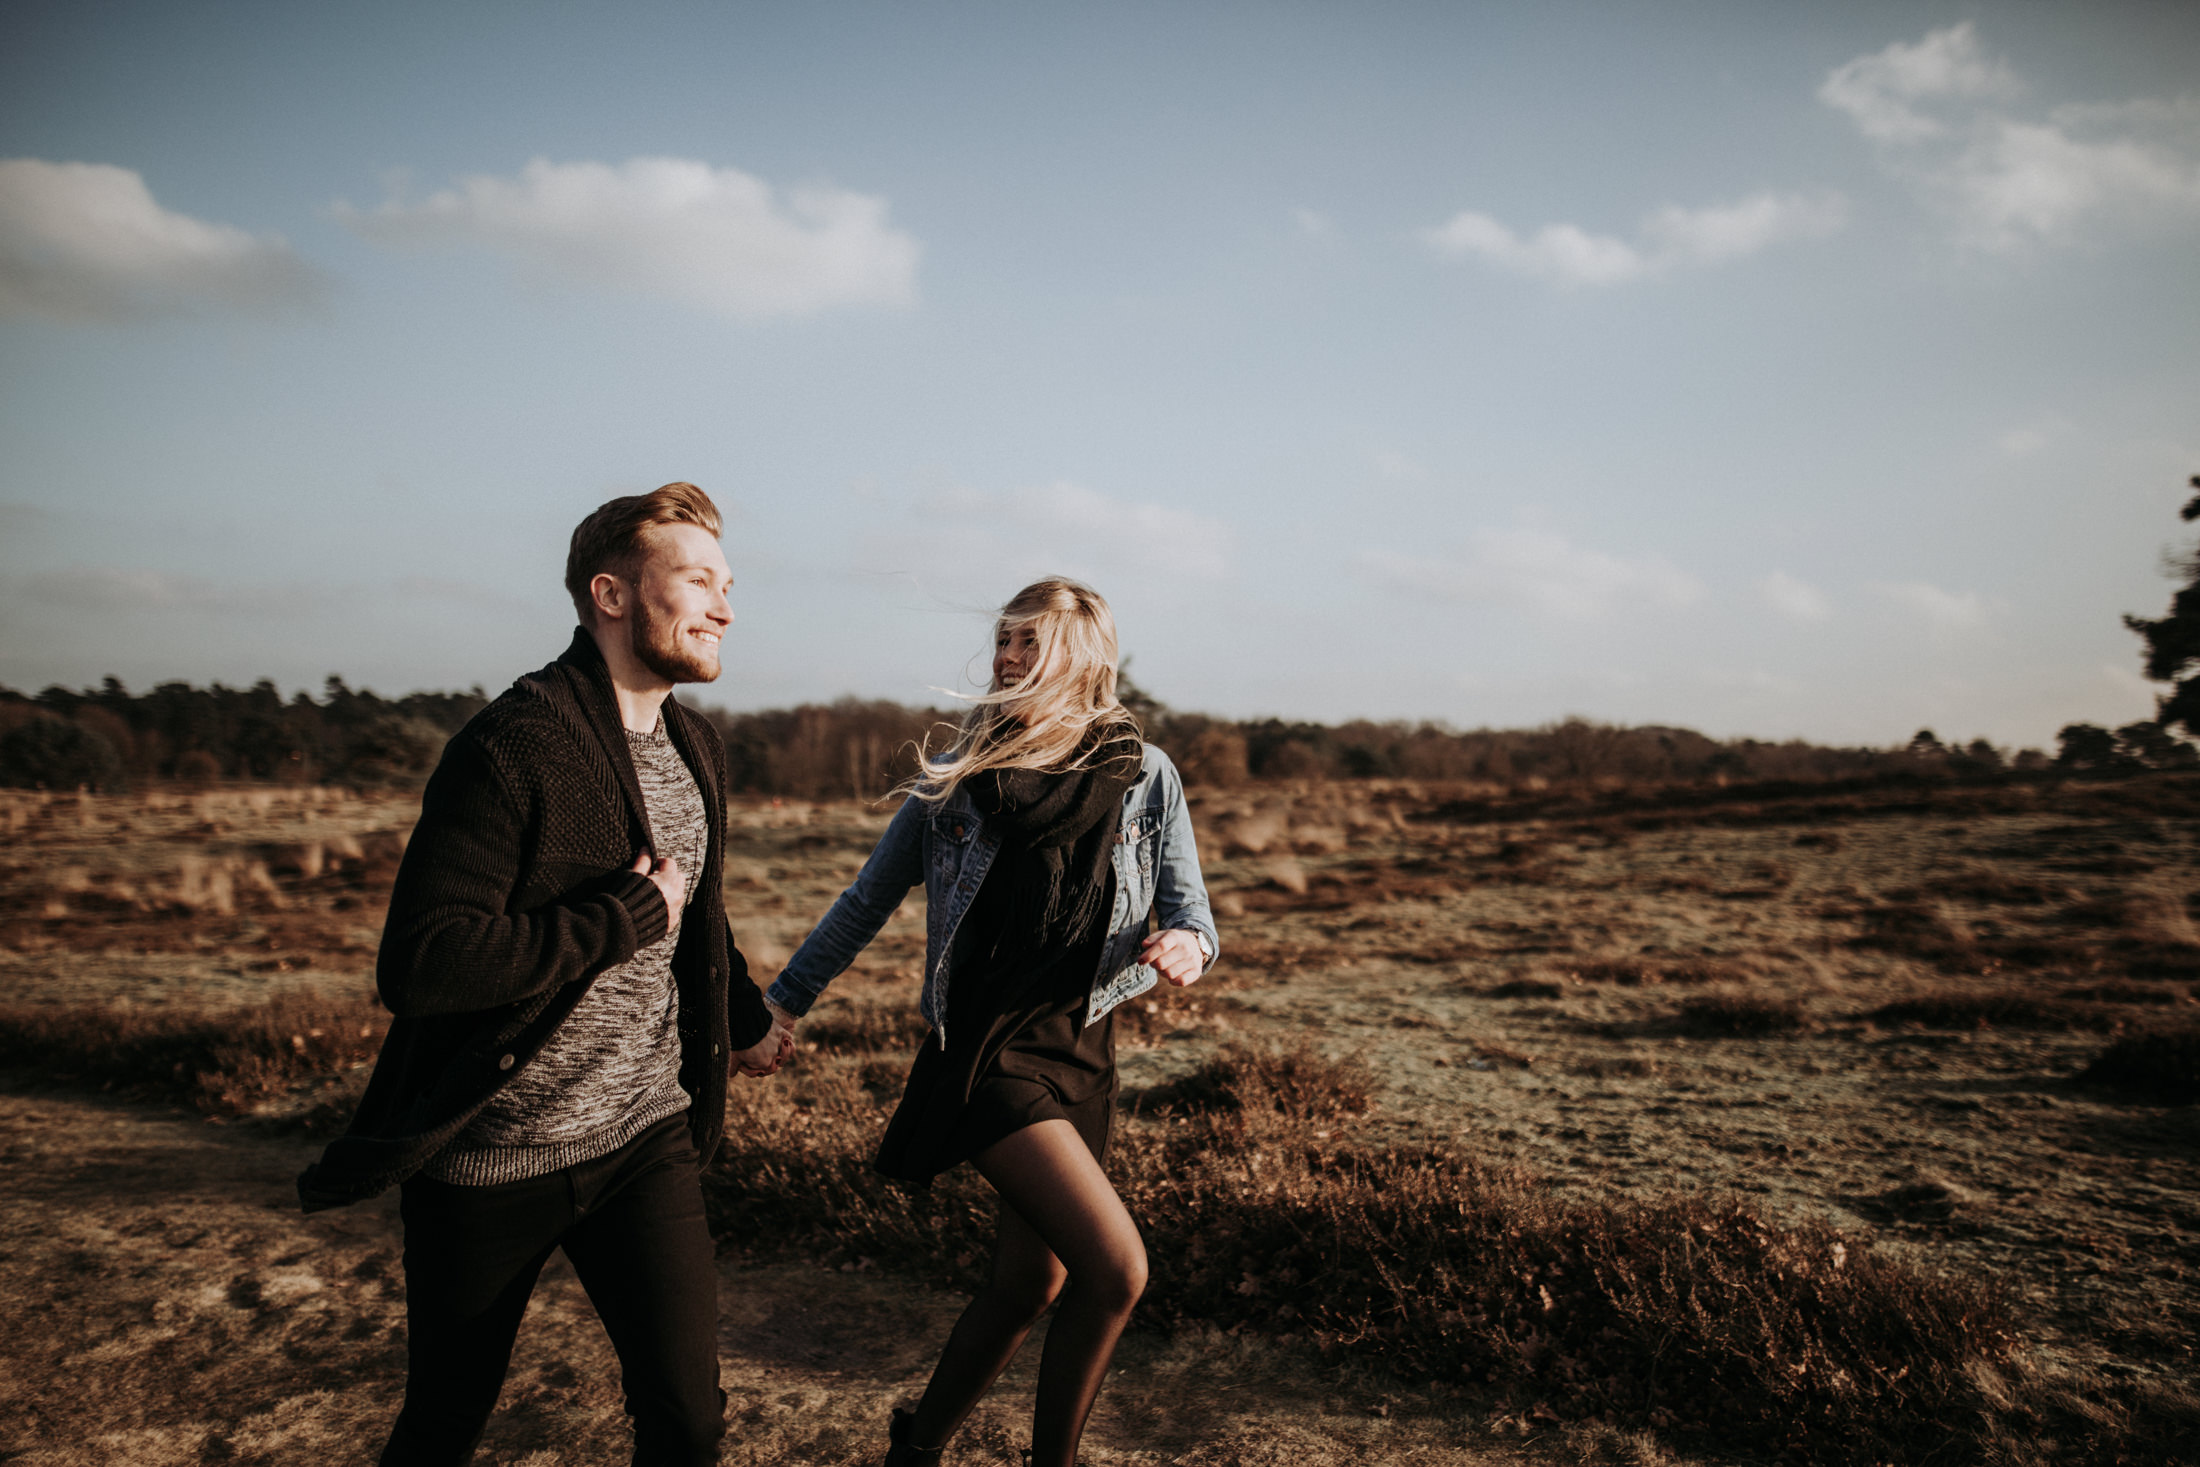 Wedding_Photographer_Mallorca_Daniela-Marquardt_Photography_CanaryIslands_Lanzarote_Iceland_Tuskany_Santorini_Portugal__Austria_Elopement_Hochzeitsfotograf_Milena_Marvin_15